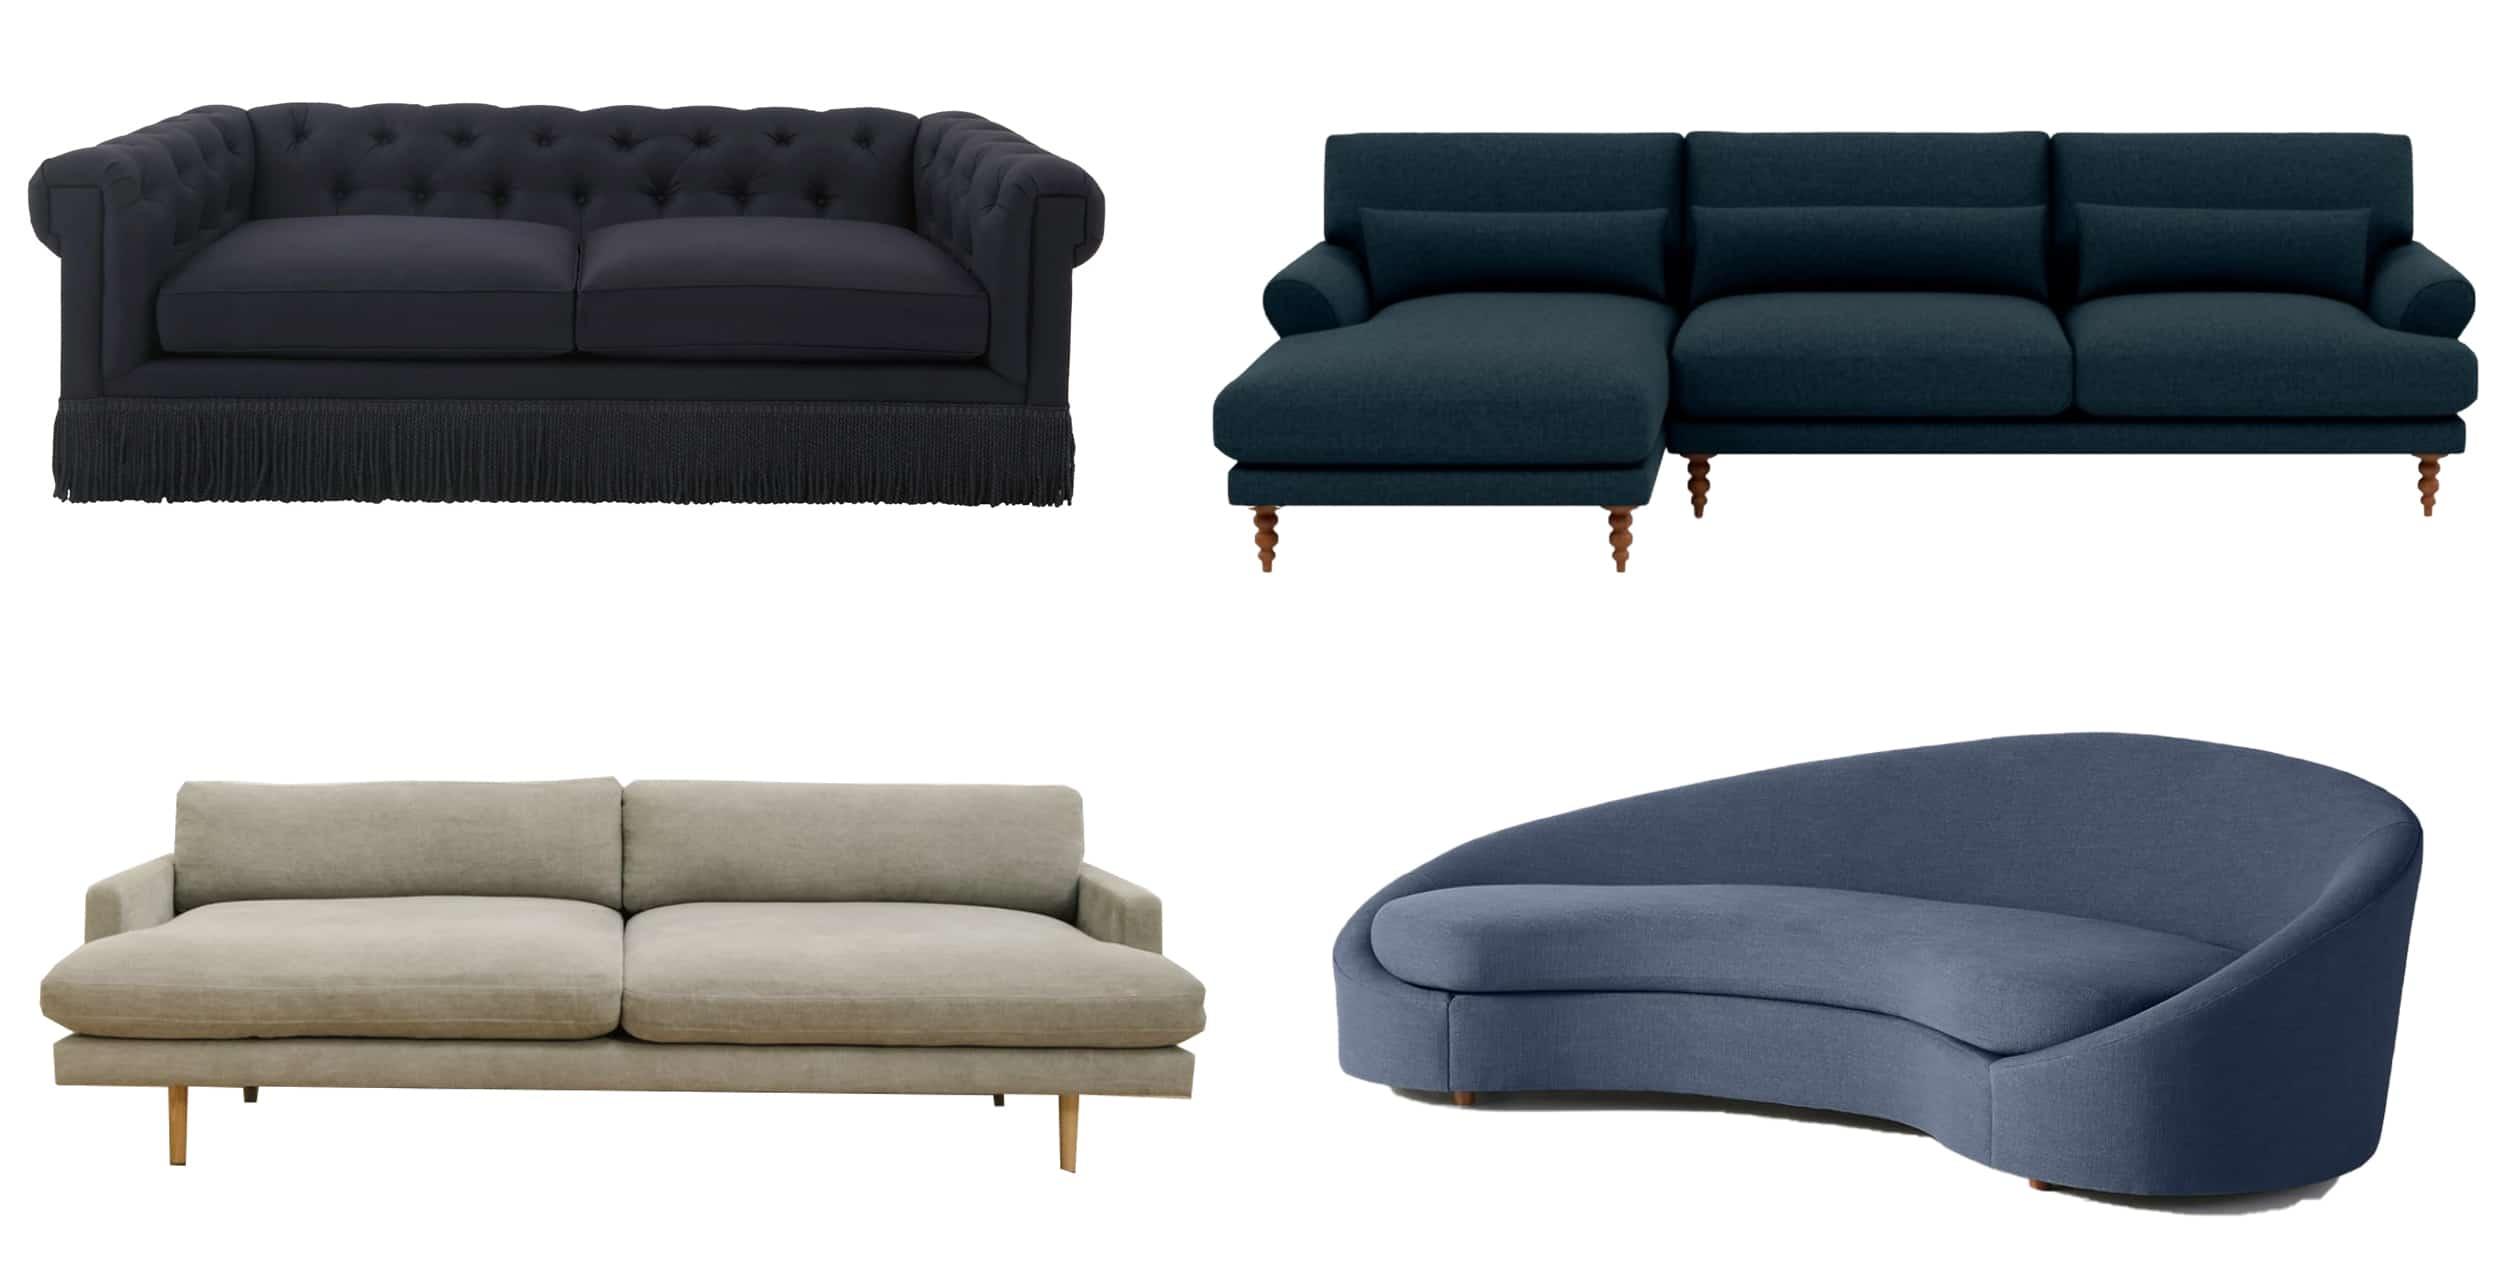 Emilyhenderson Waverly Living Room Refresh Sofa New 02